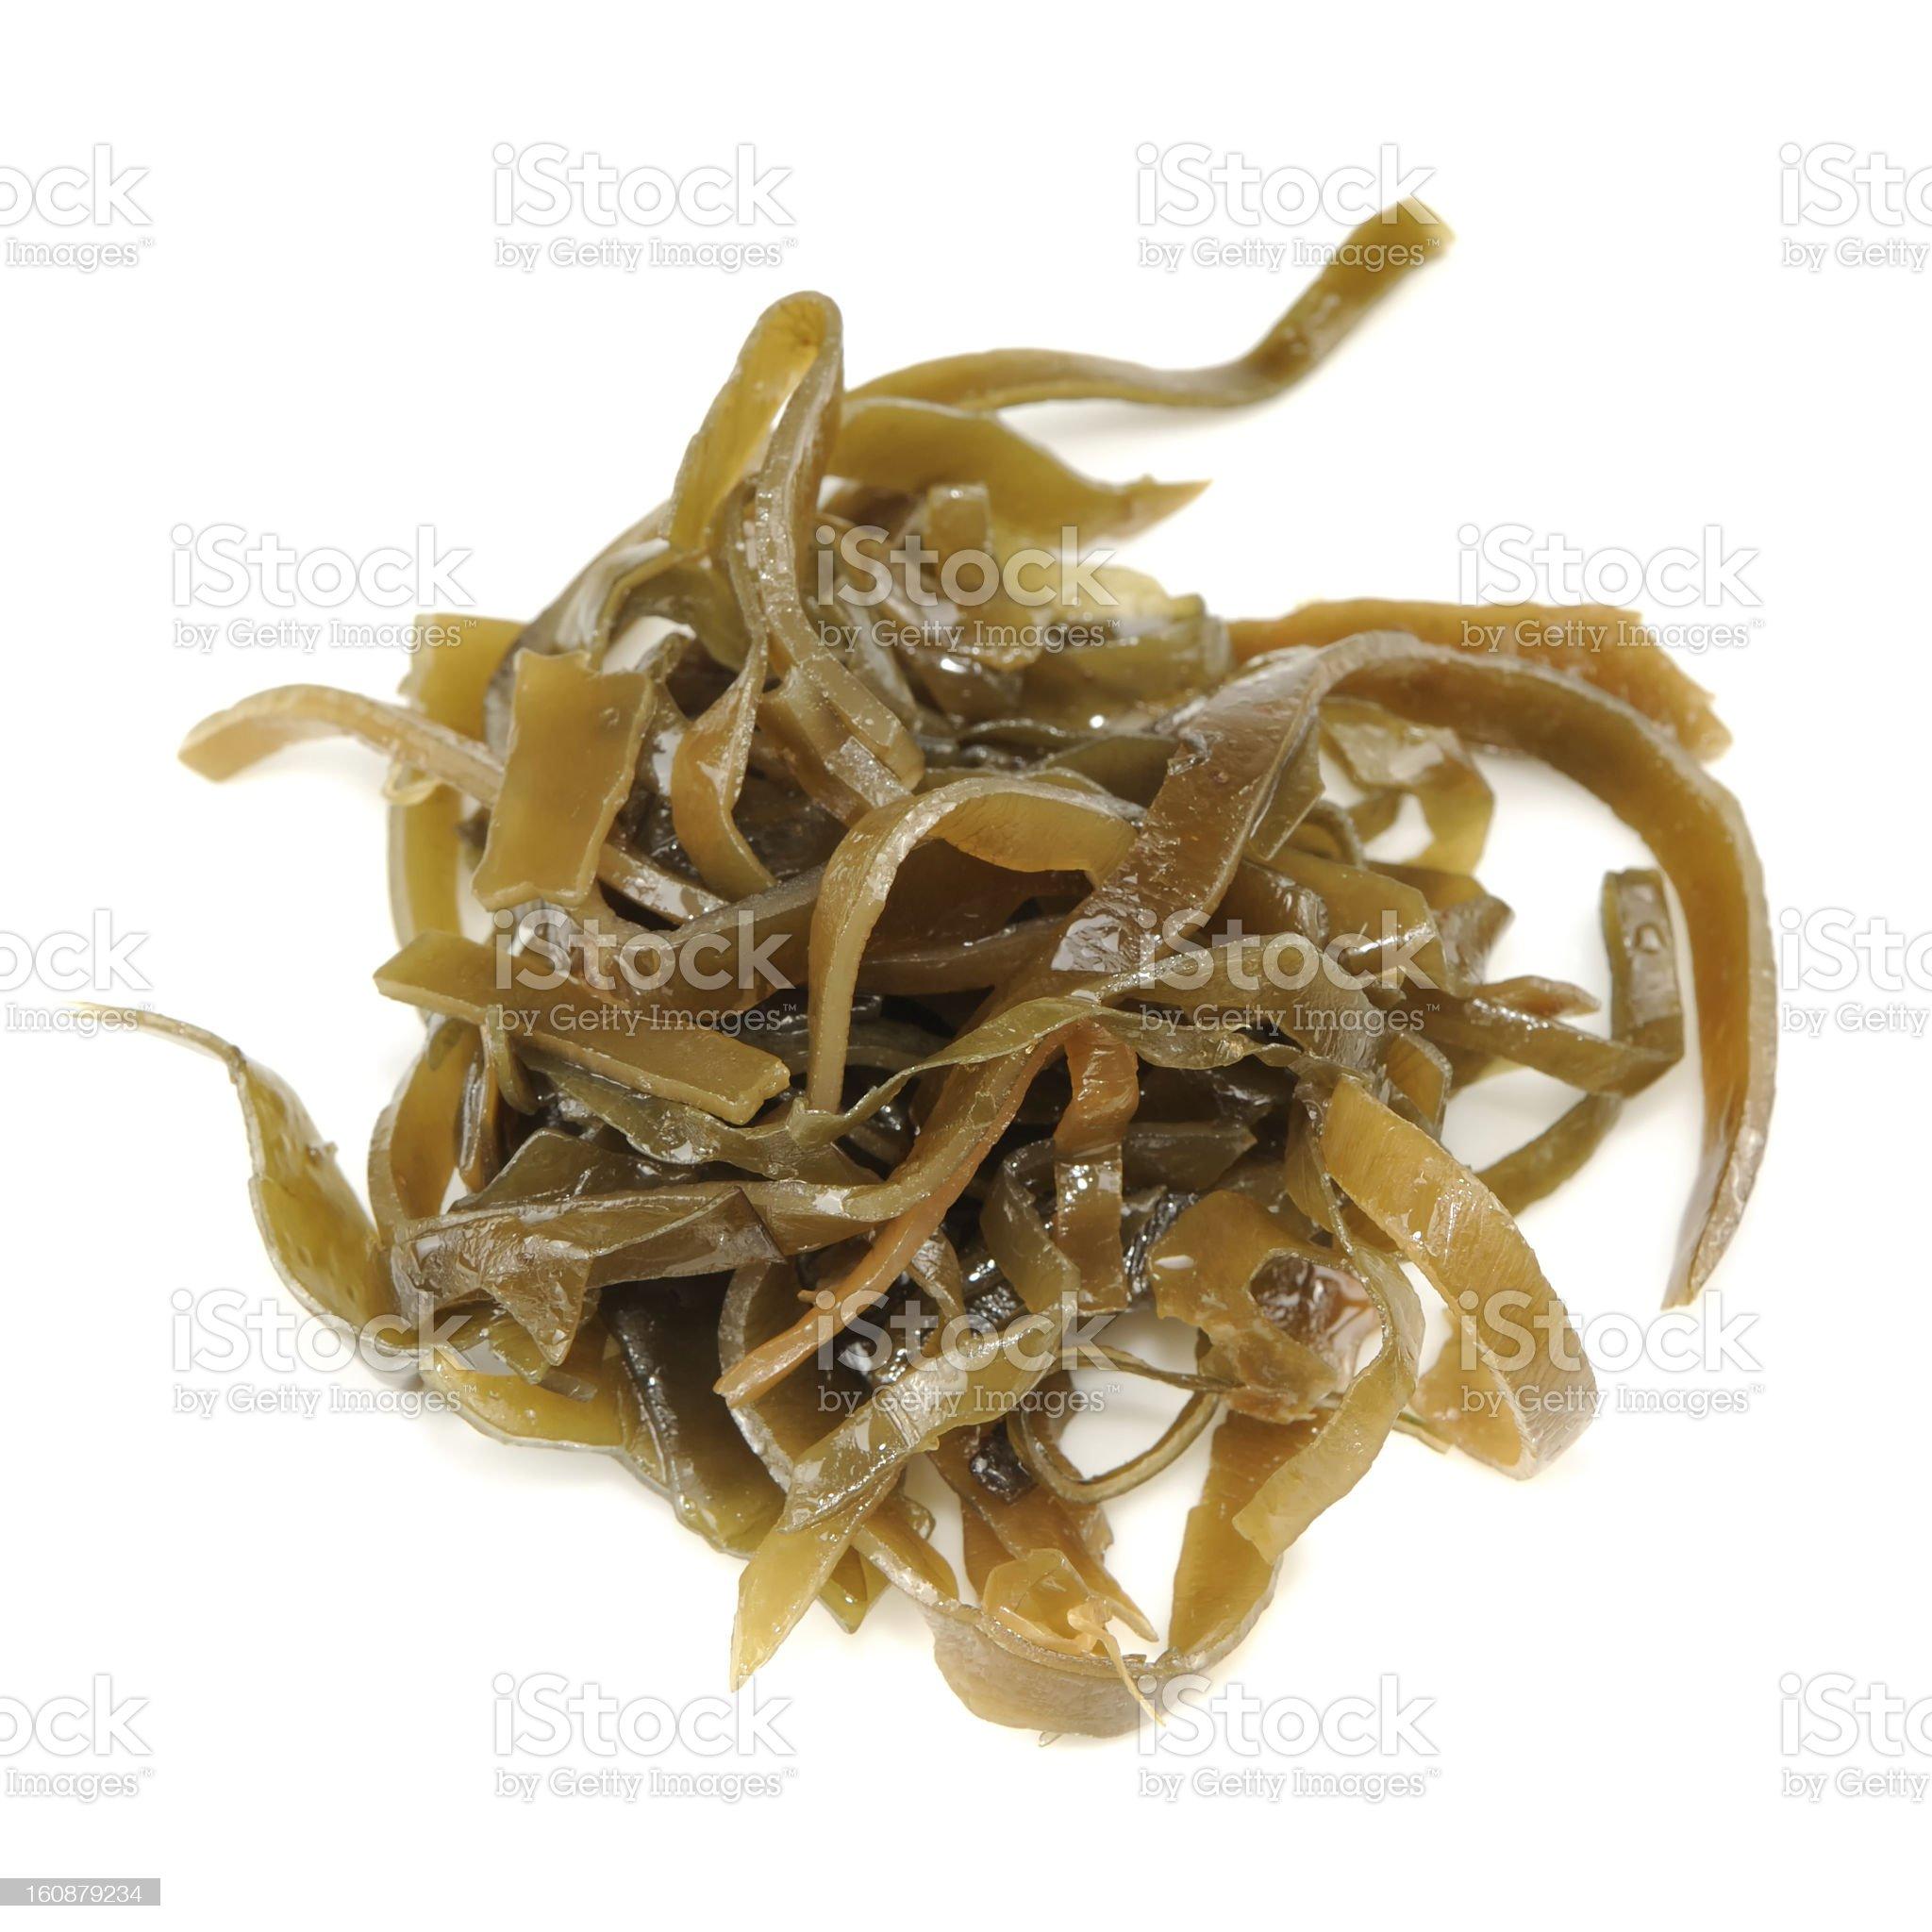 Laminaria (Kelp) Seaweed Isolated on White Background royalty-free stock photo